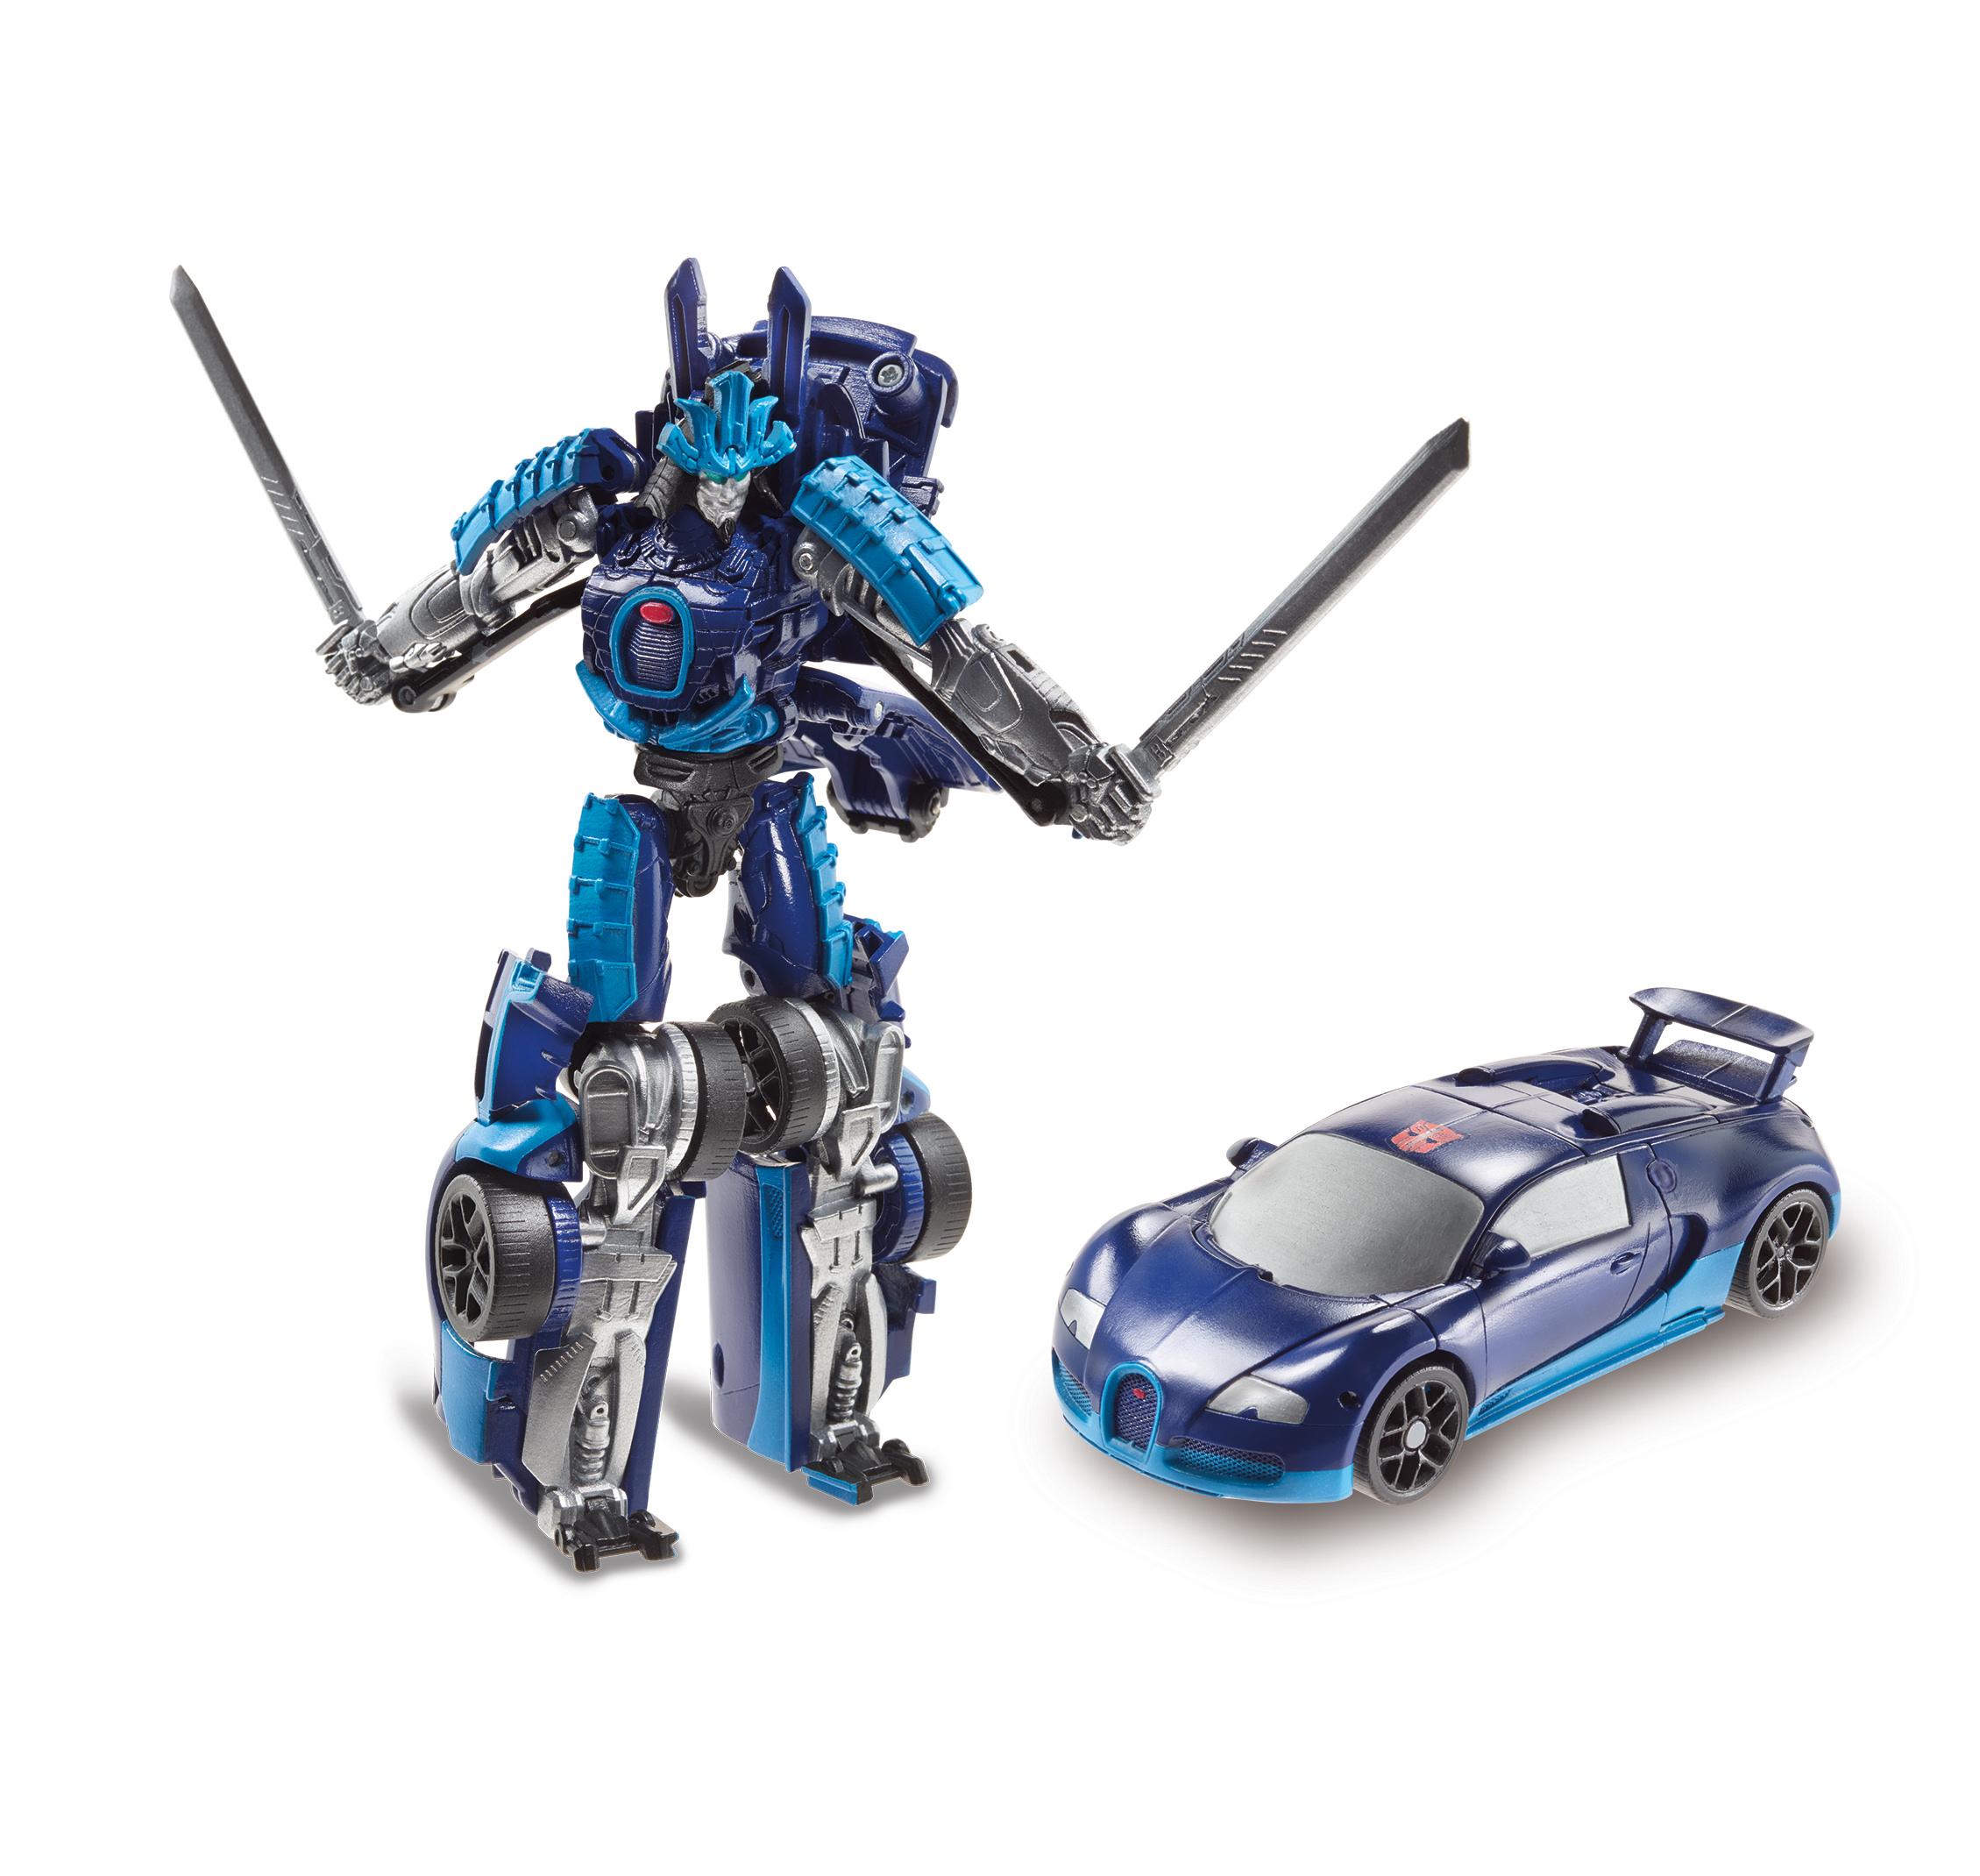 Трансформер Autobot - DriftИгрушки трансформеры<br>Трансформер Autobot - Drift<br>